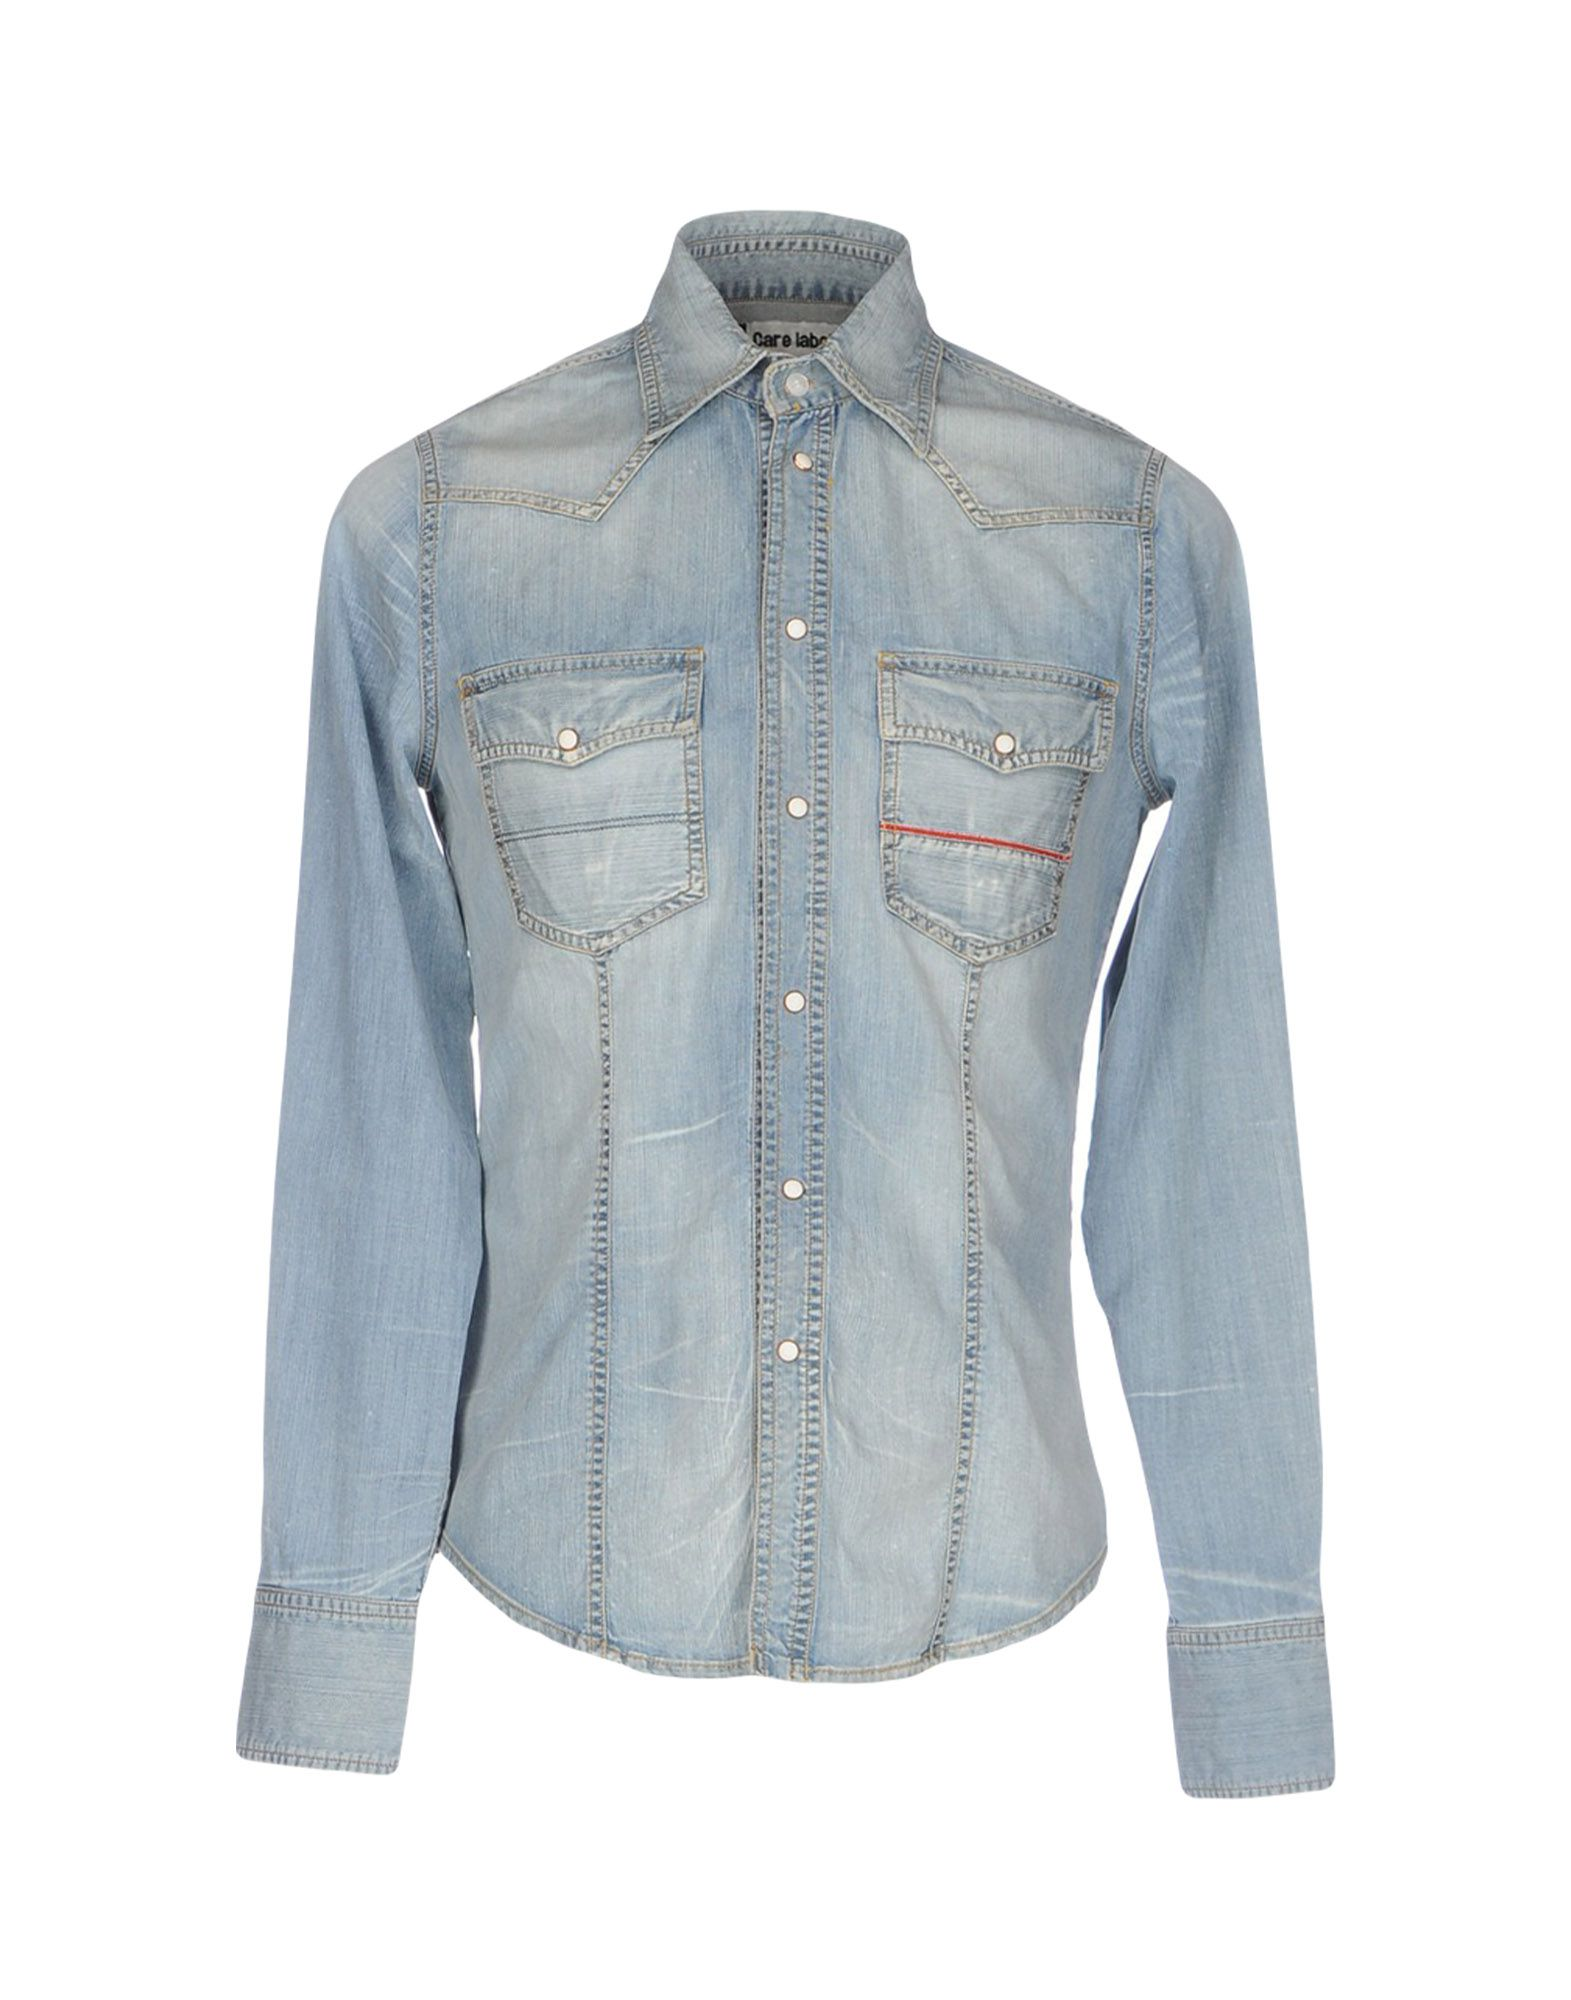 CARE LABEL Herren Jeanshemd Farbe Blau Größe 5